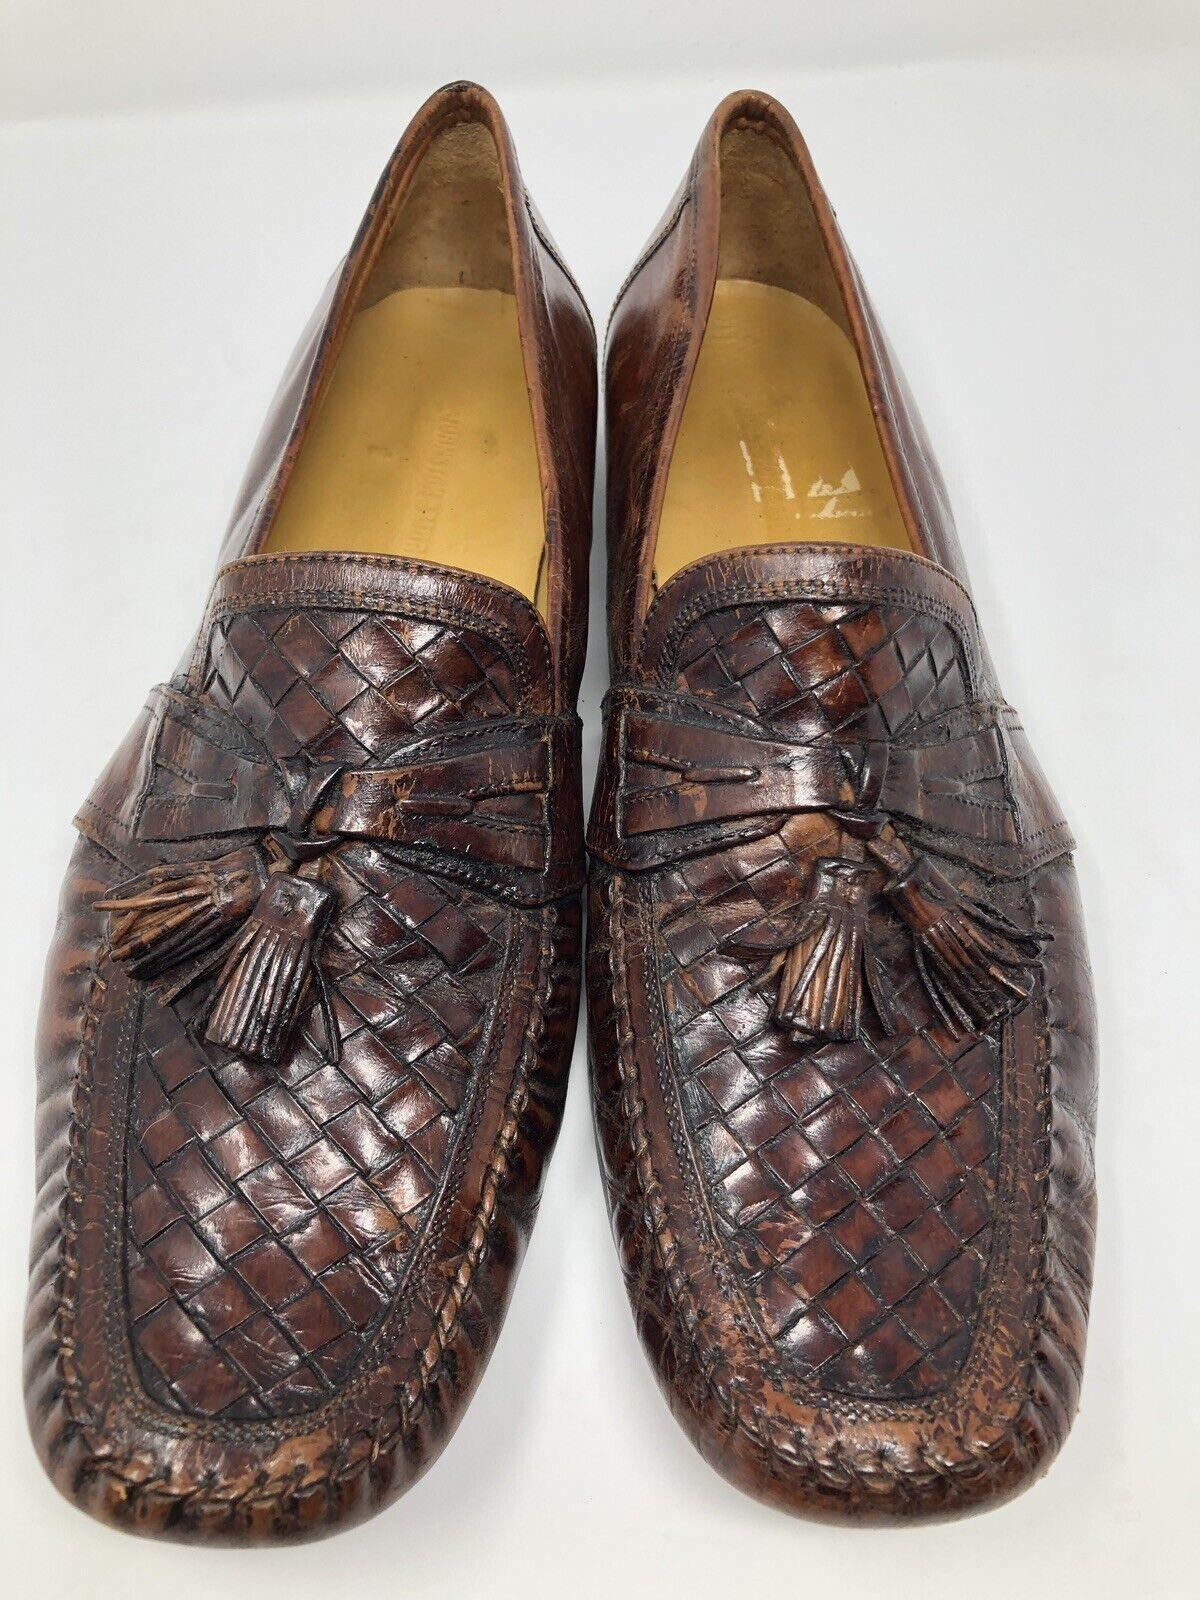 Johnston & Murphy Brown Leather Tassel Loafers Men's US 12